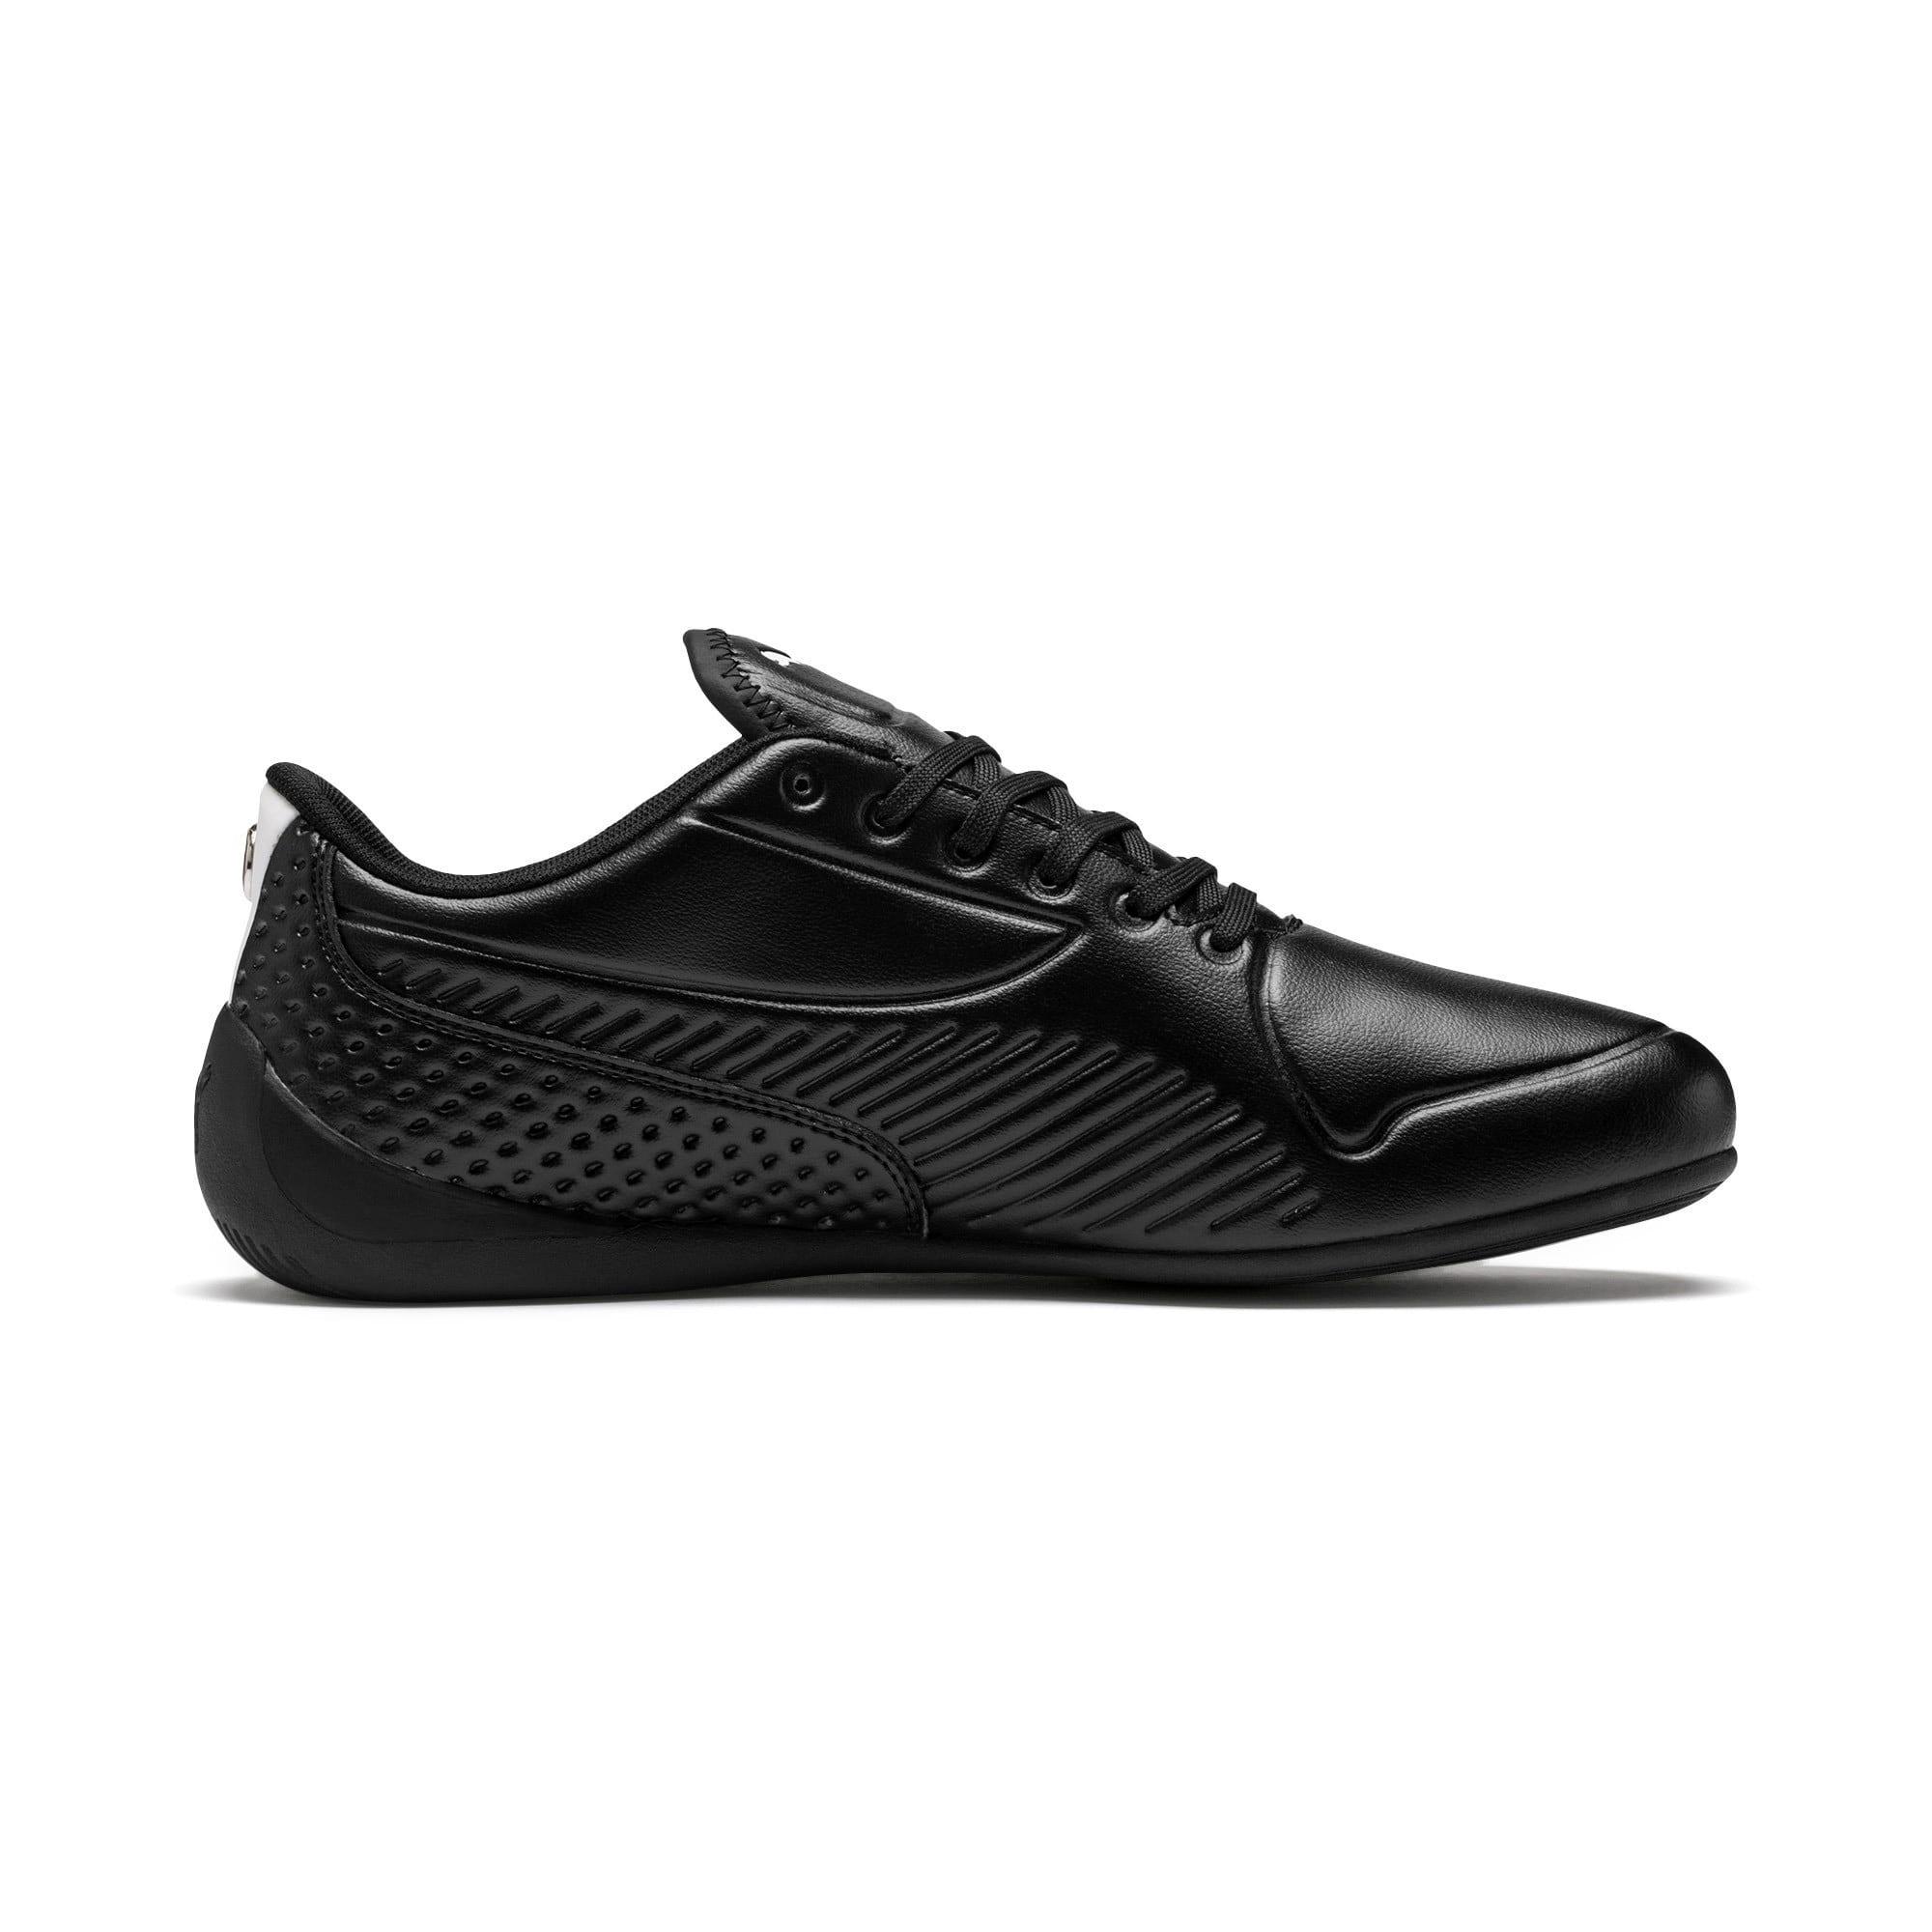 Thumbnail 6 of BMW M Motorsport Drift Cat 7S Ultra Shoes, Puma Black-Puma White, medium